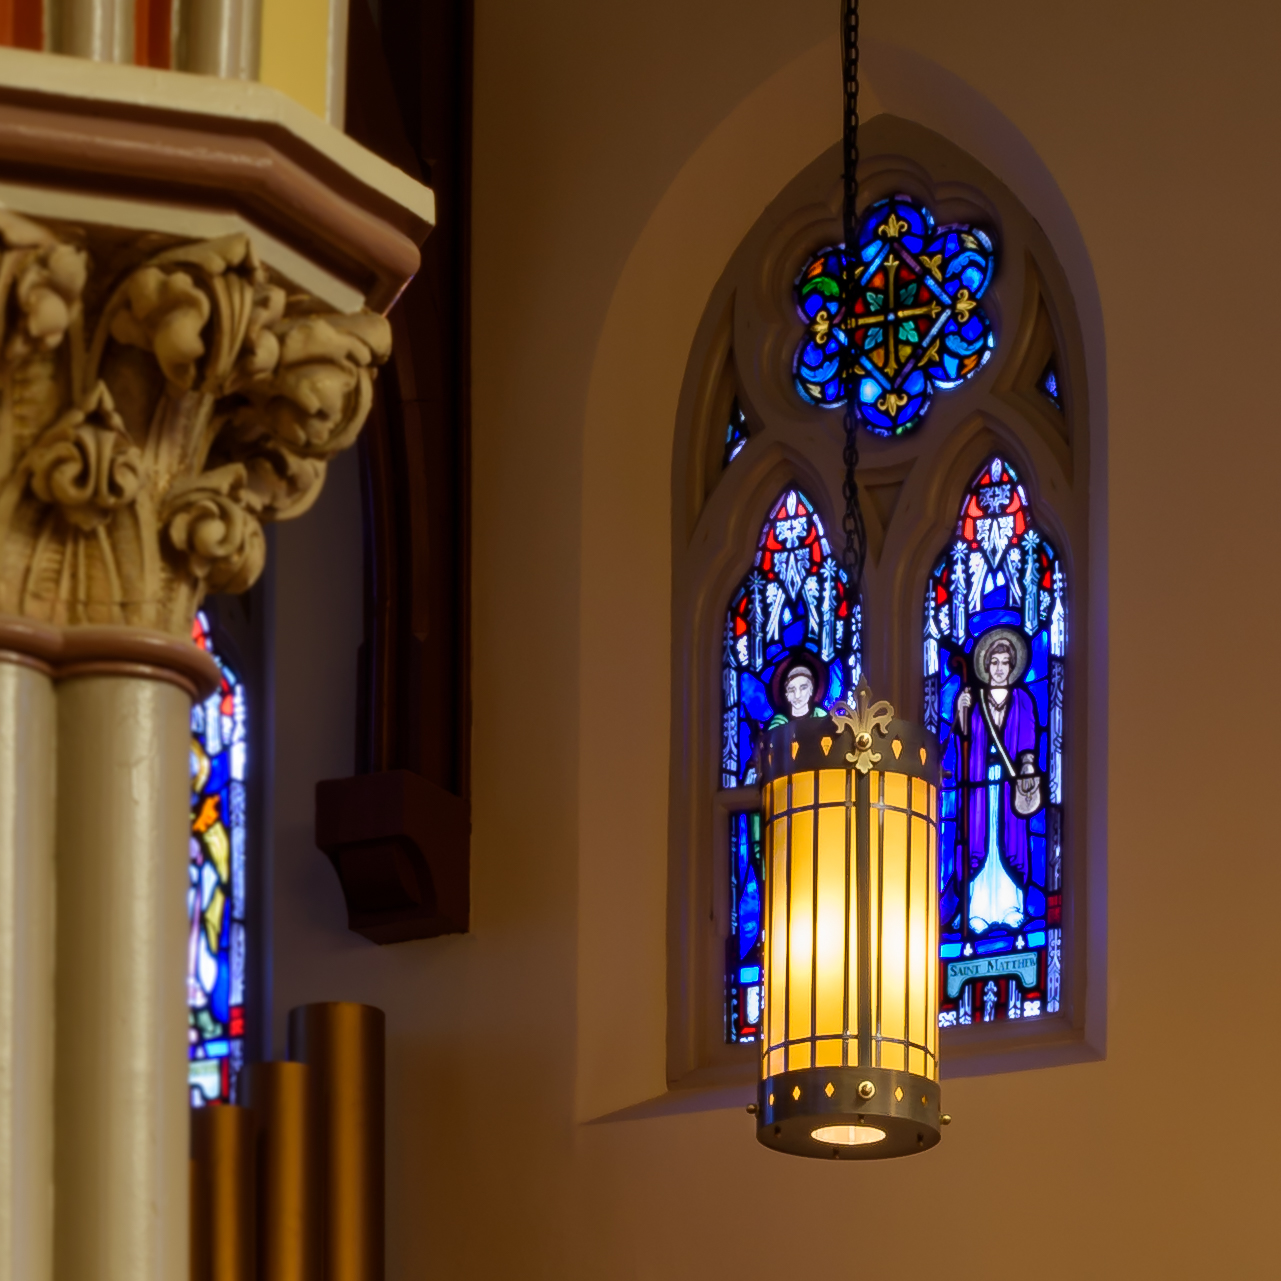 St. Vincent's Madison NJ glass window